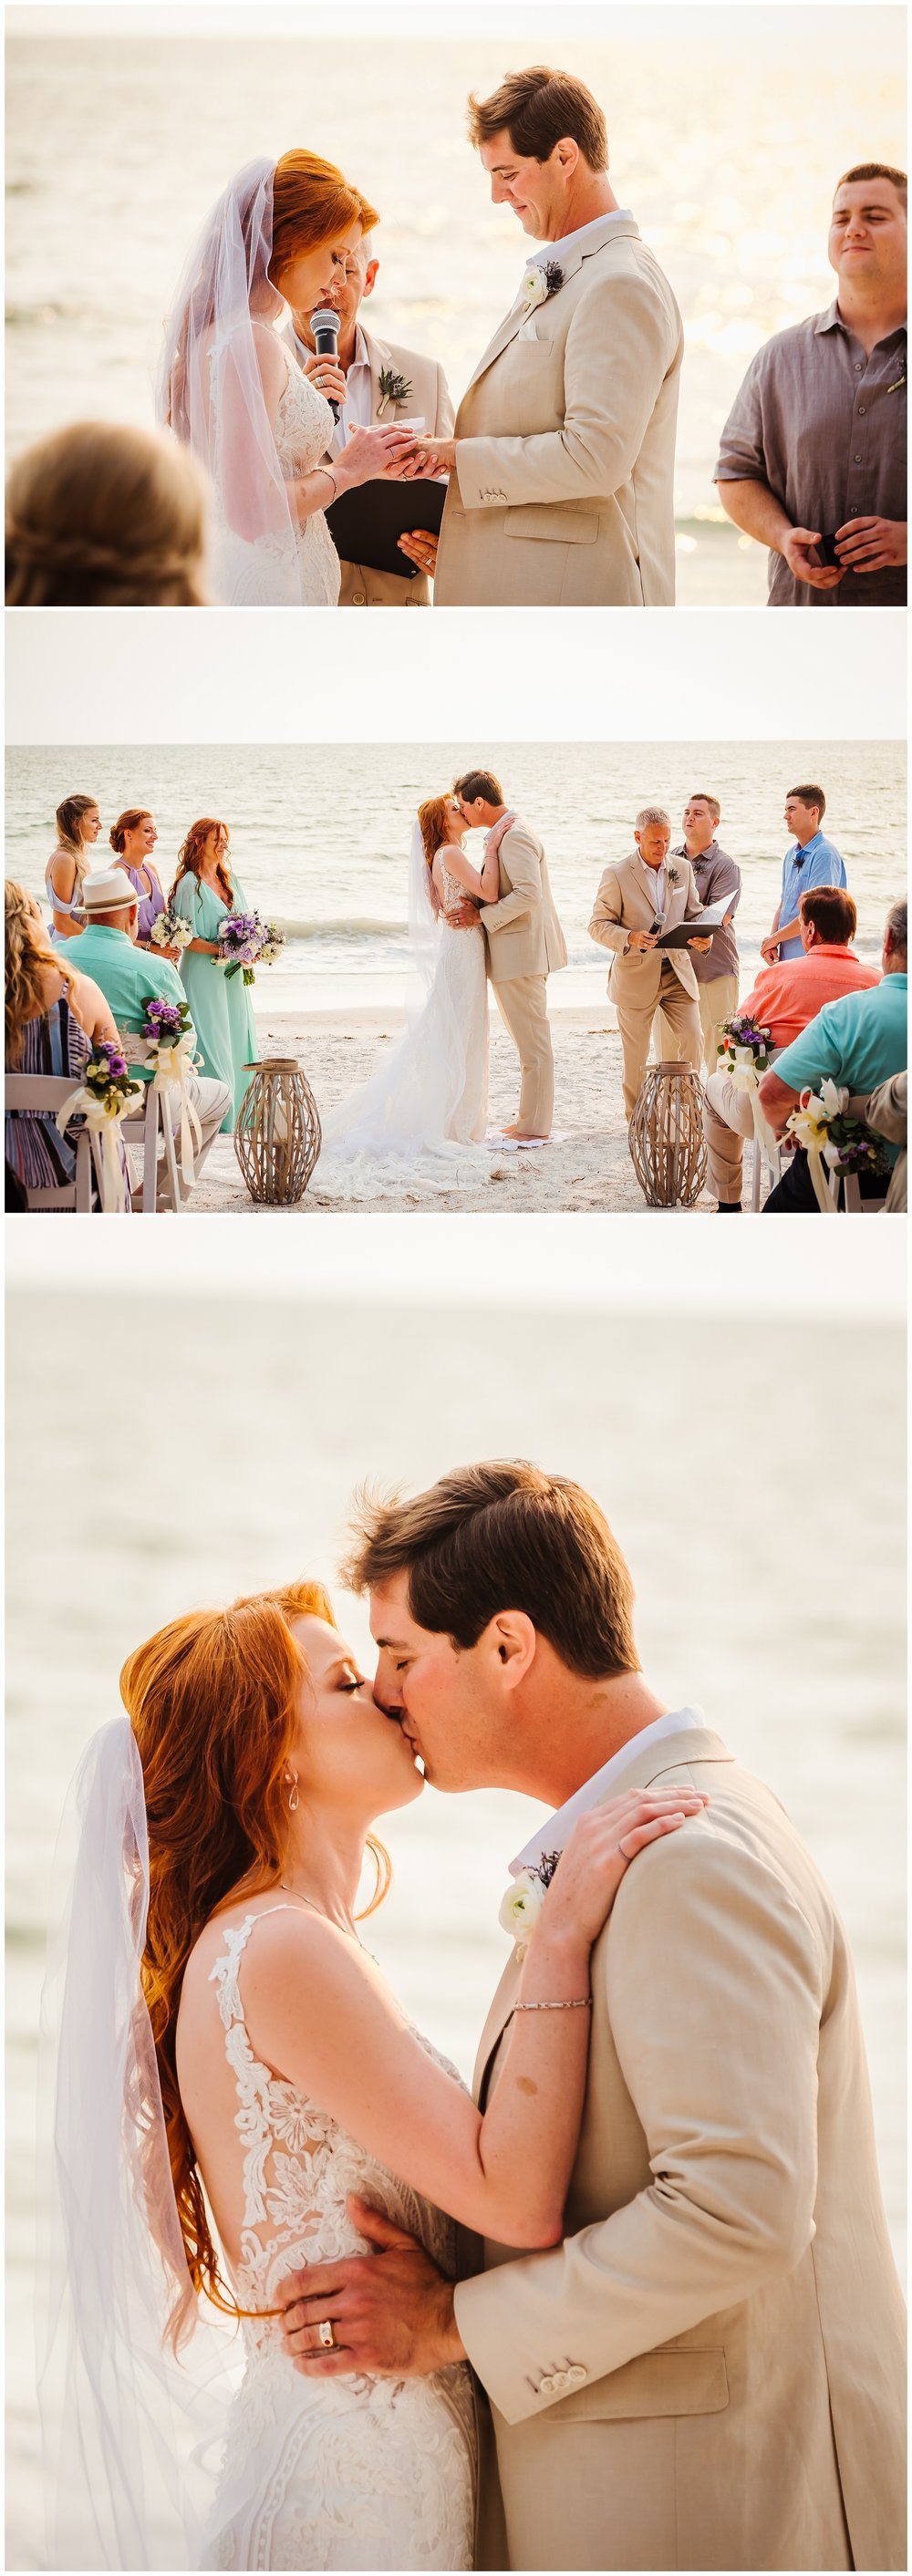 tampa-st-pete-wedding-photographer-indian-rocks-beach-mermaid-train-redhead_0138.jpg